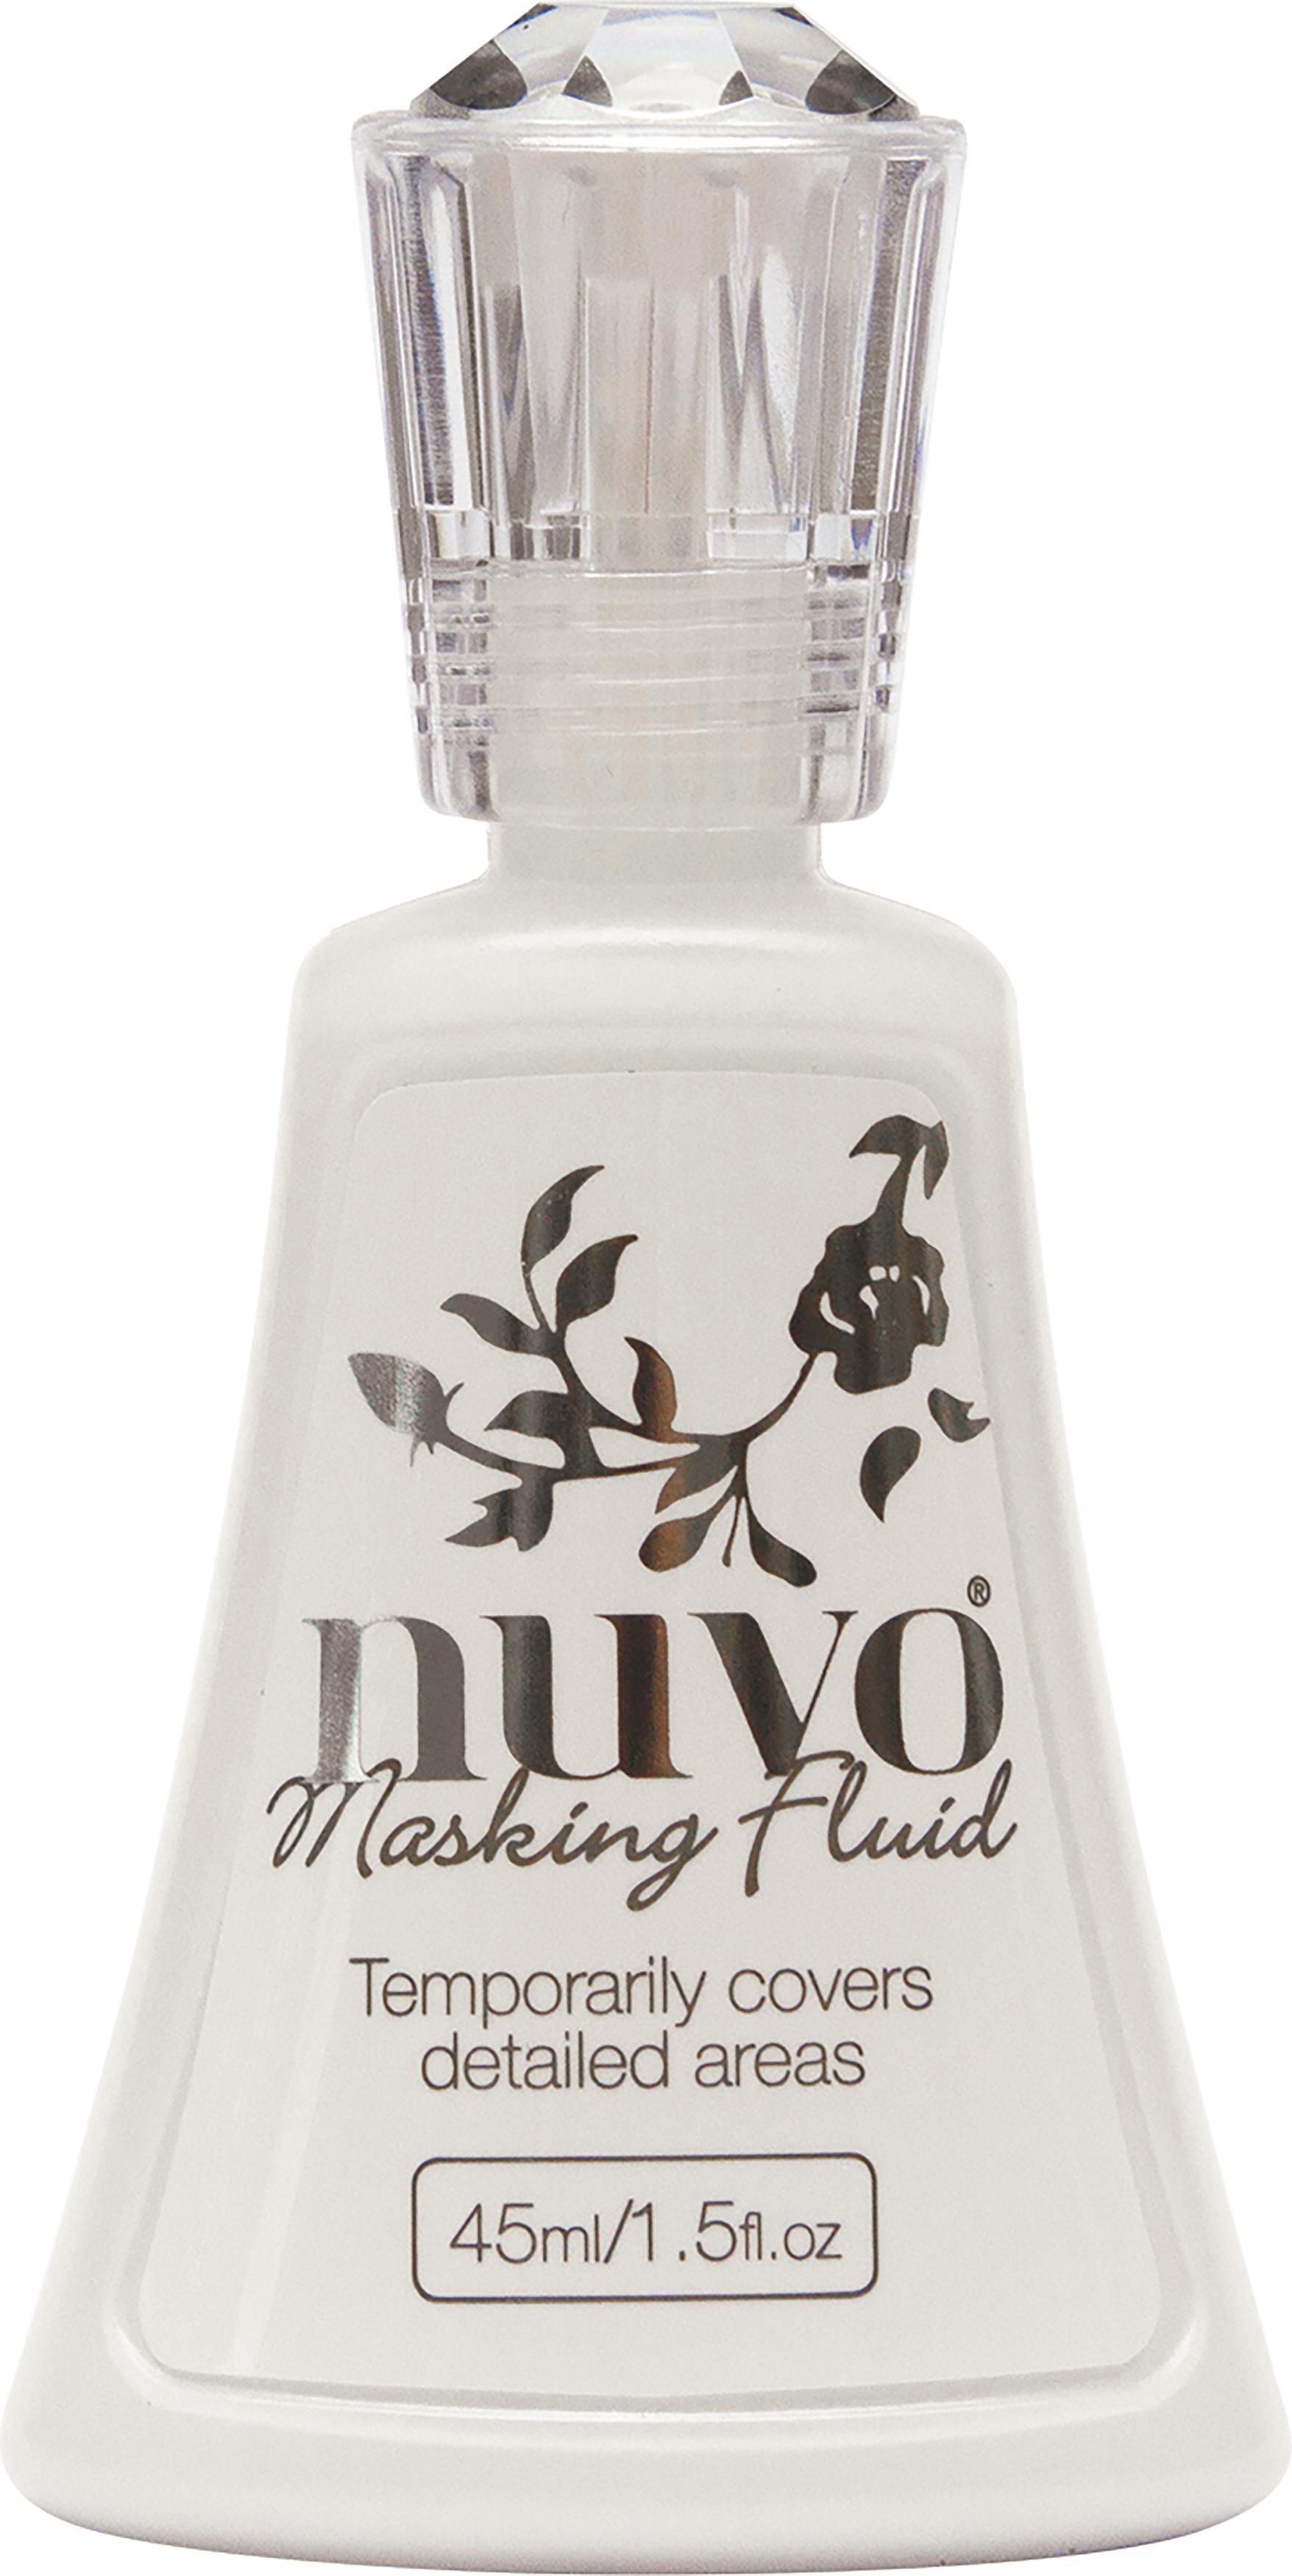 Nuvo Masking Fluid 1.5oz-